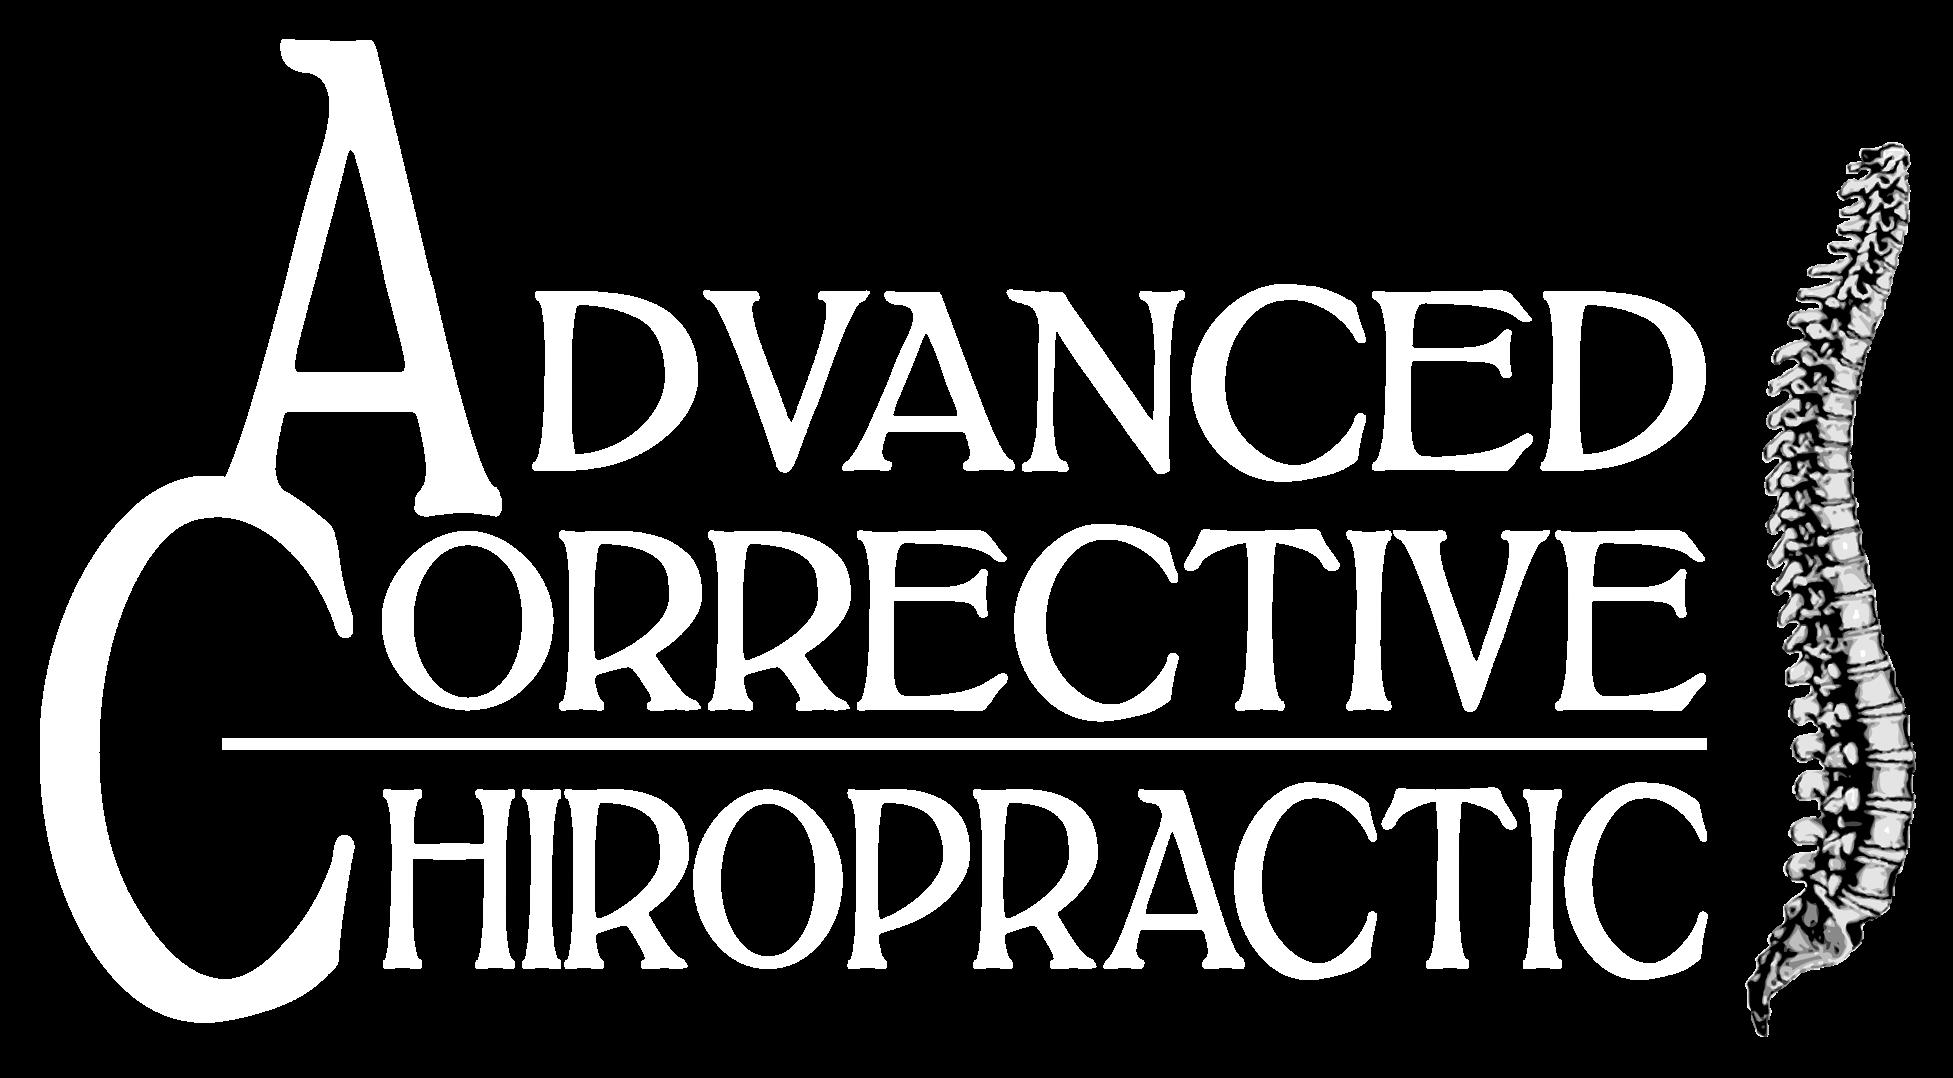 Advanced Corrective Chiropractic Logo